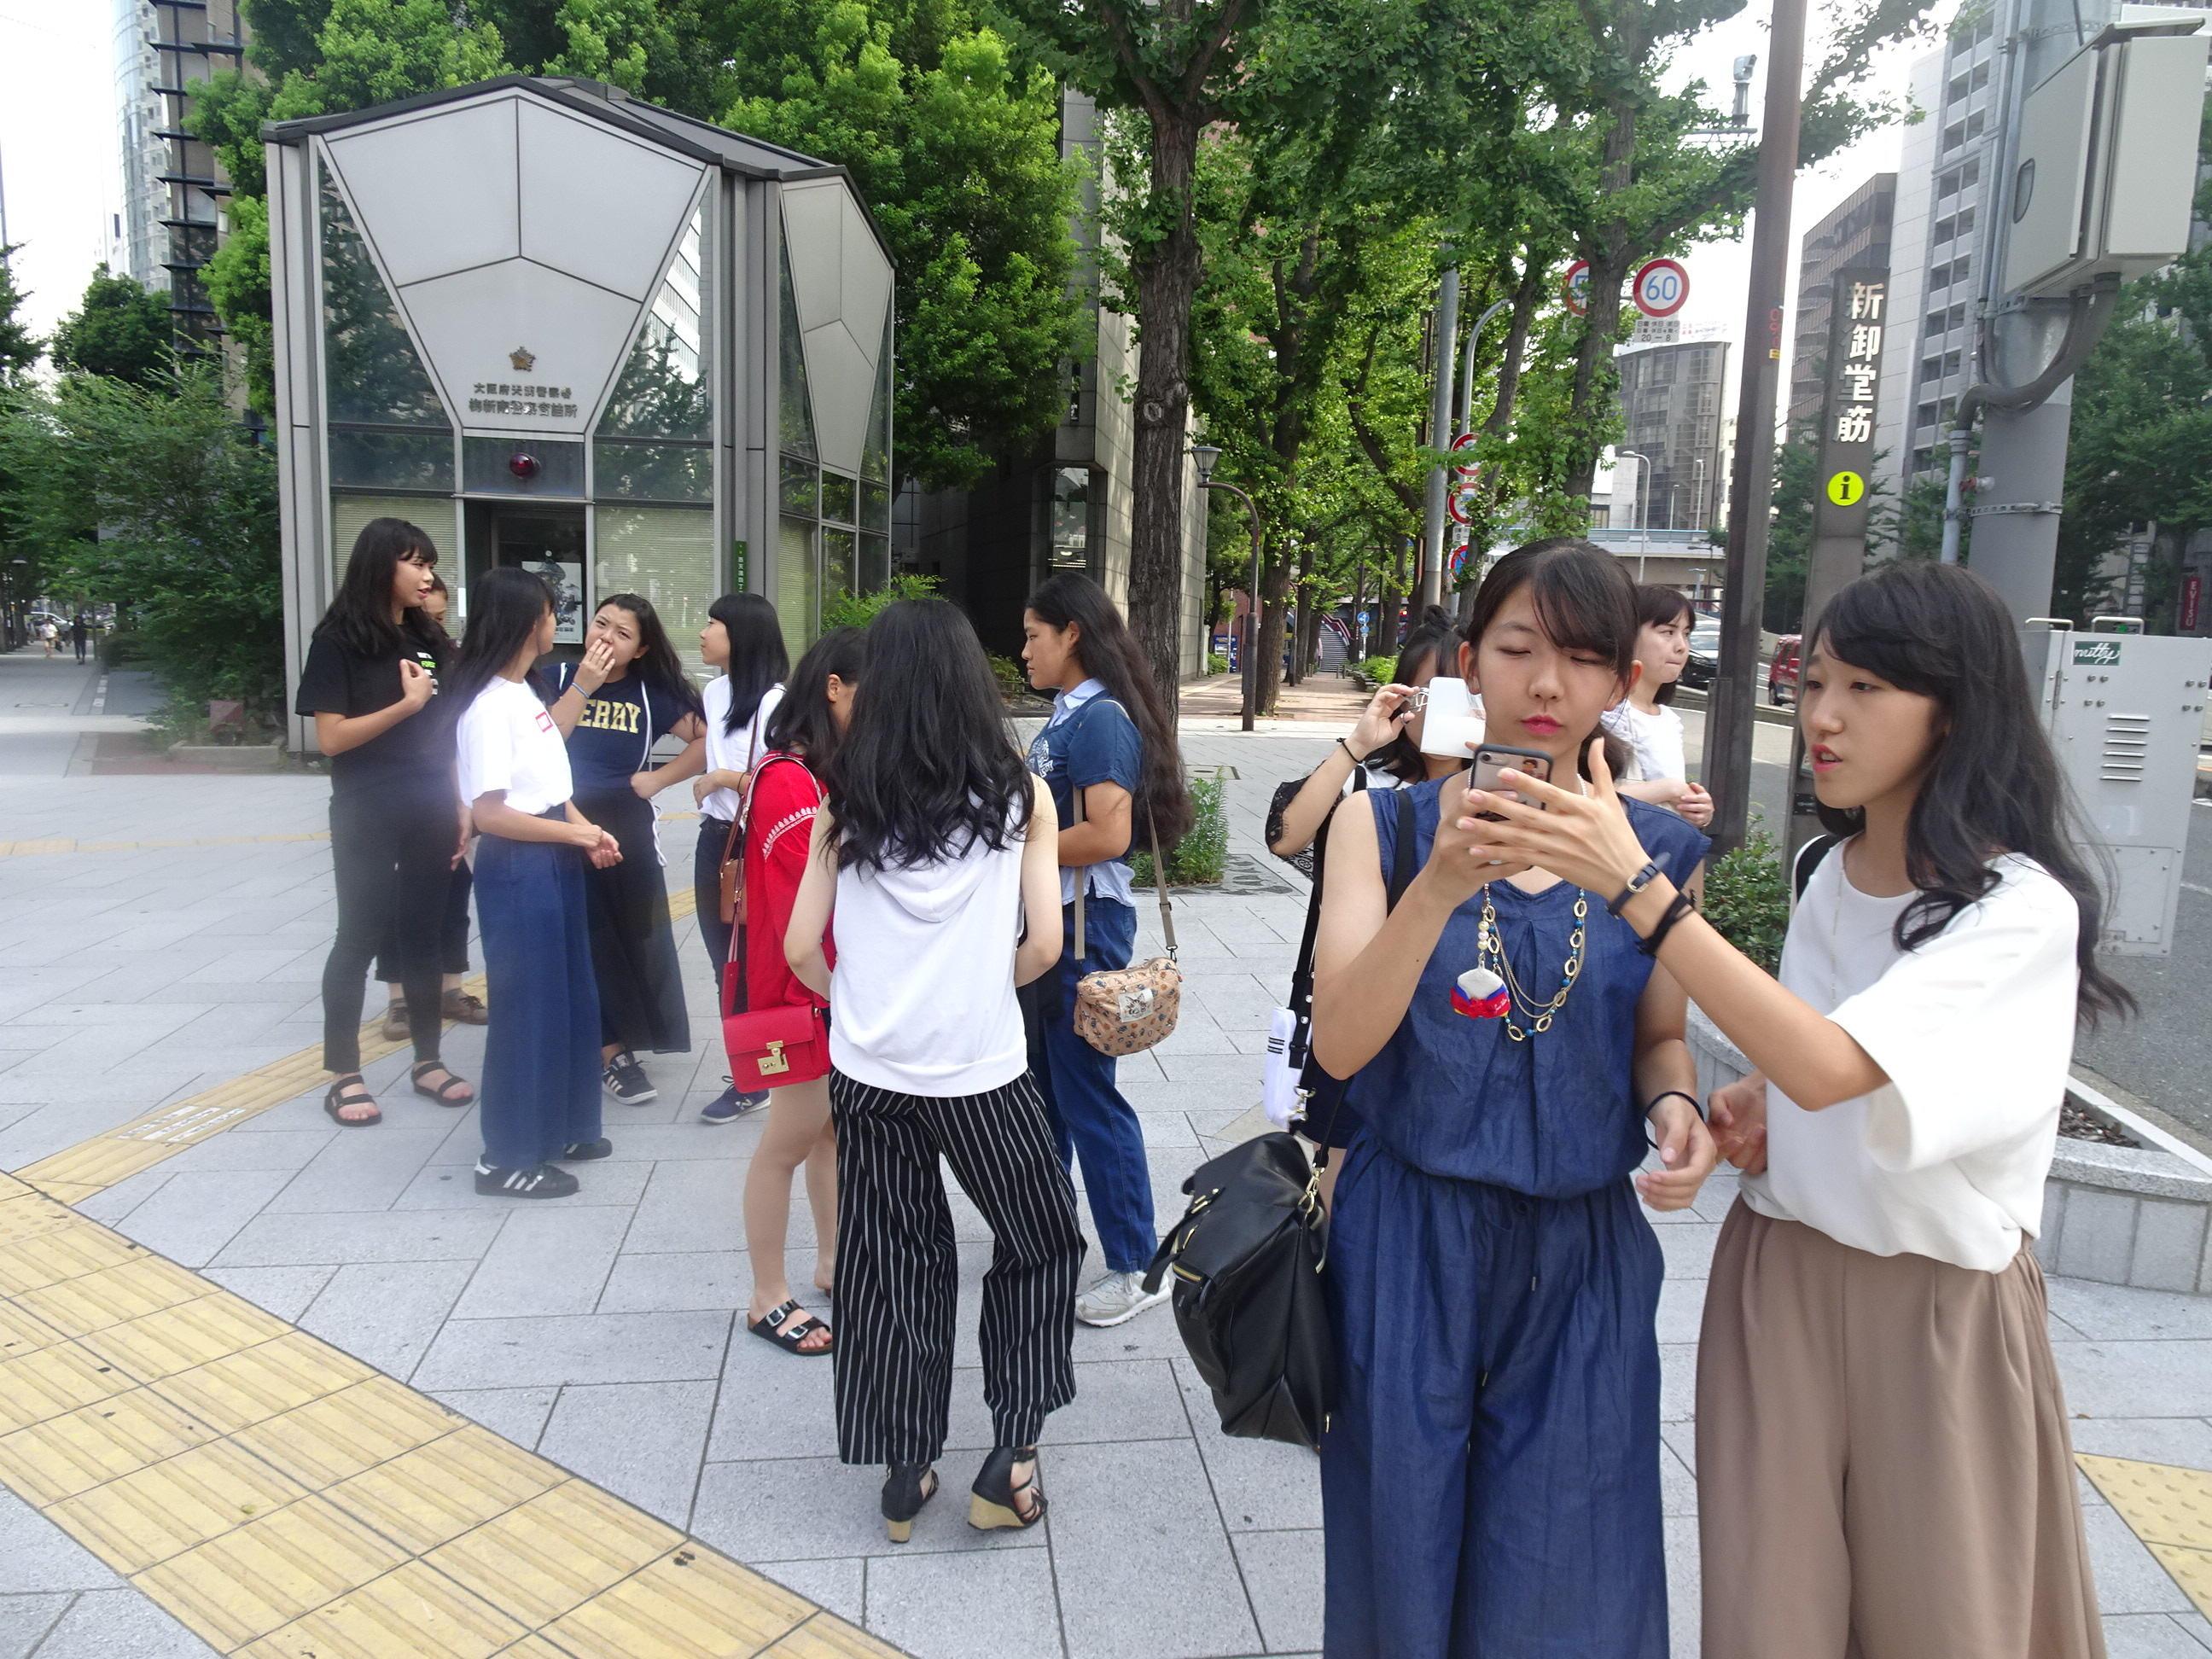 180803 To Tokyo (9).JPG